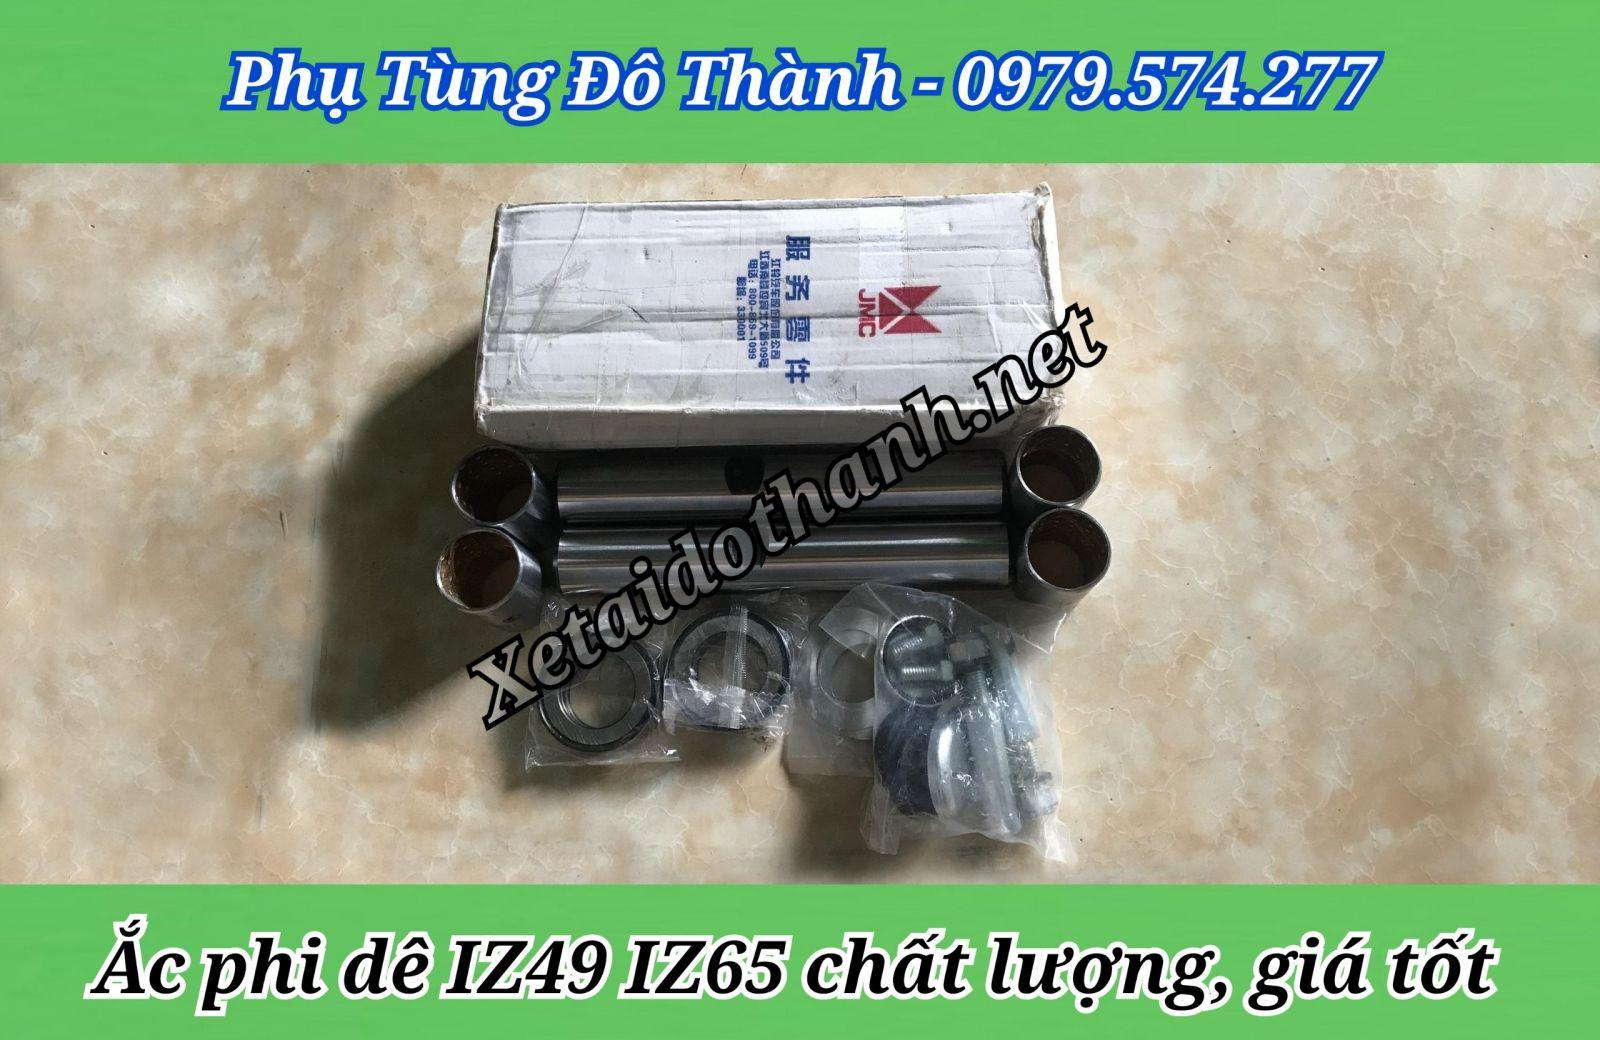 AC PHI NHE DO THANH IZ49